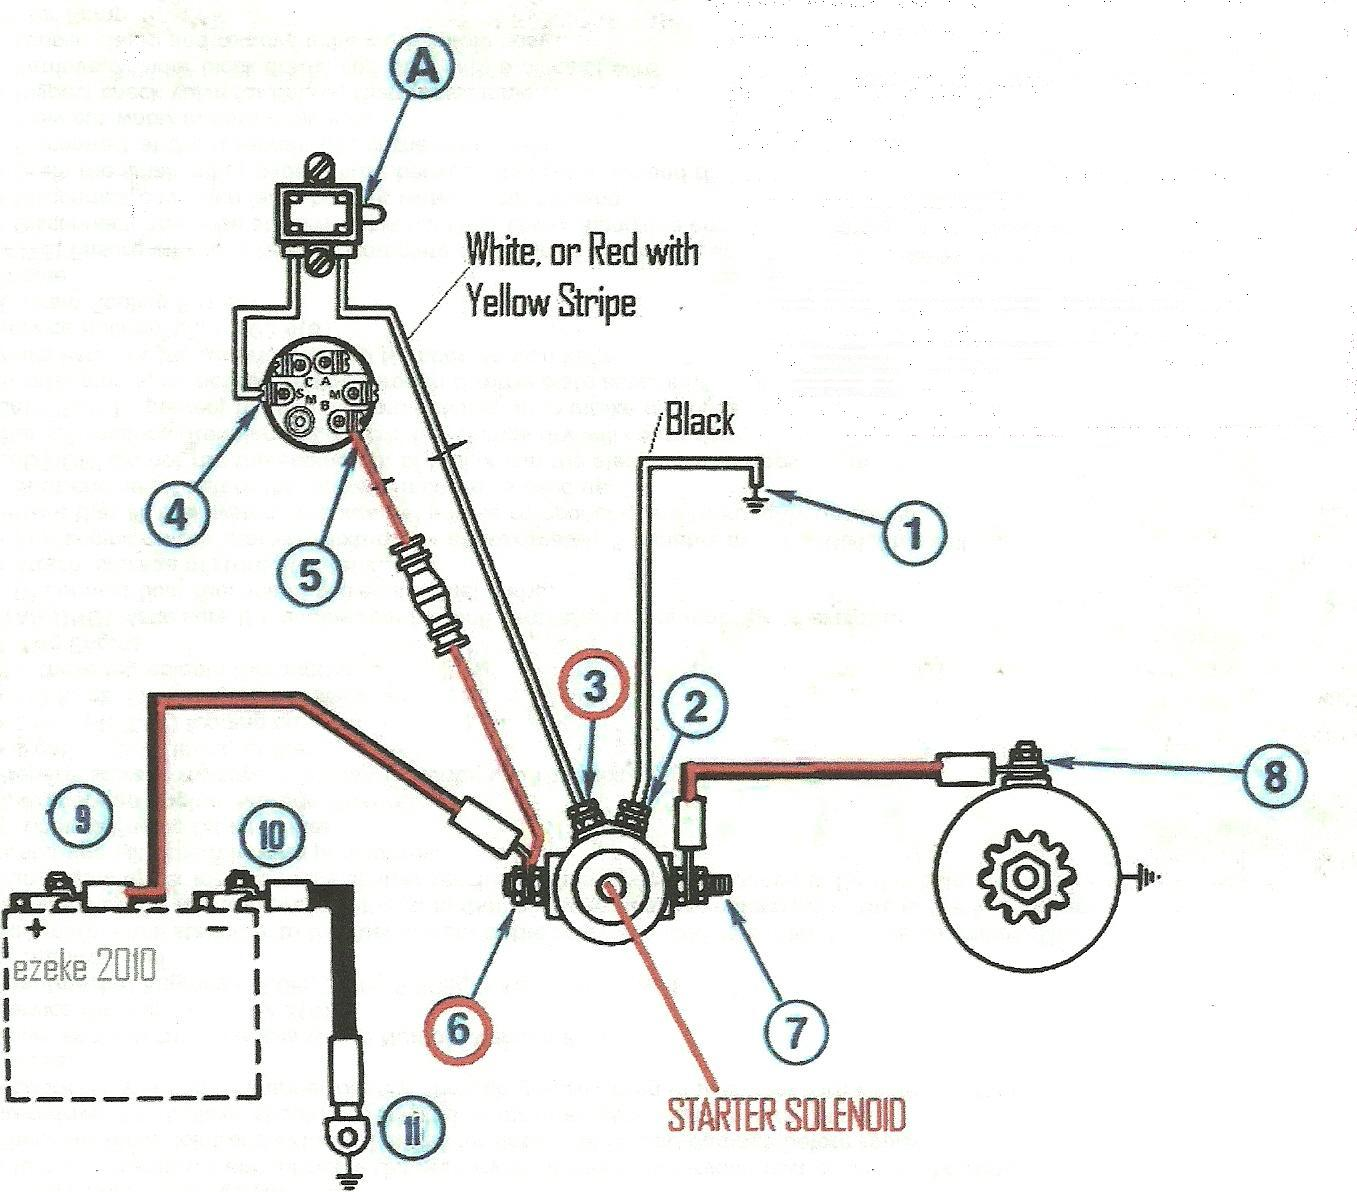 4 pole solenoid wiring diagram sd 5618  john deere tractor ignition switch wiring diagram wiring  ignition switch wiring diagram wiring